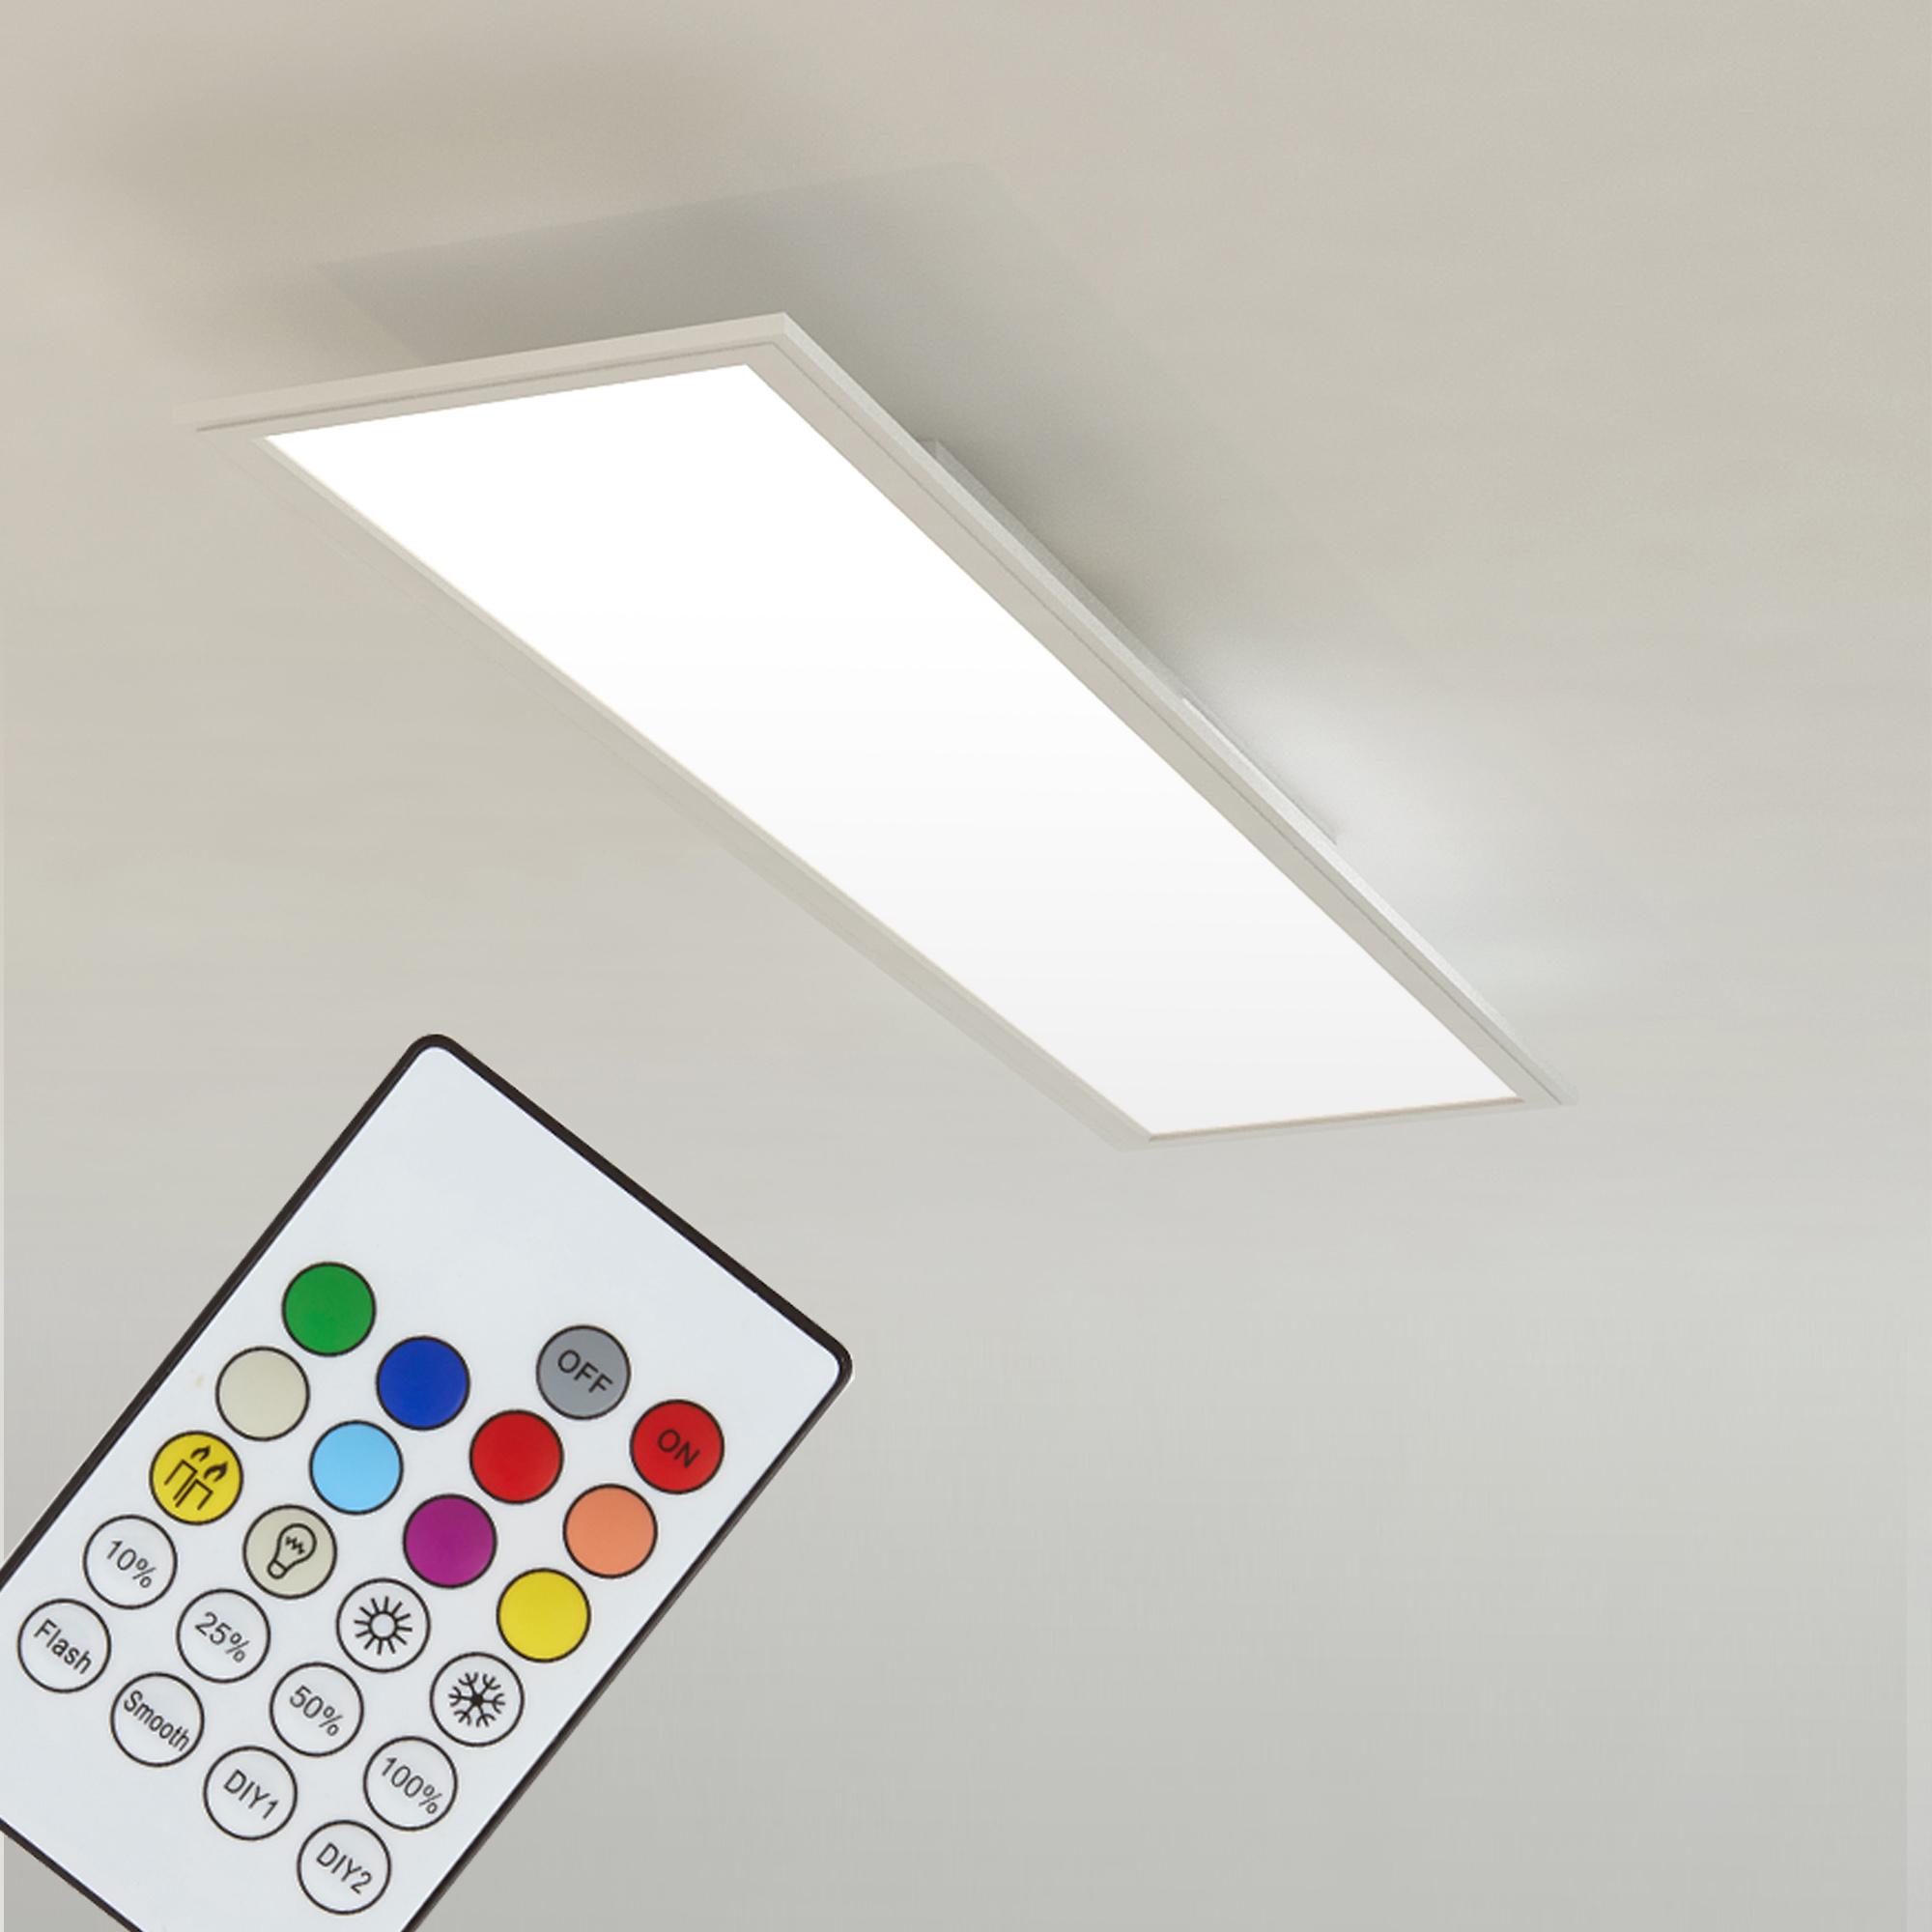 SMART LED Panel, 59,5 cm, 1200 LUMEN, 18 WATT, Weiss